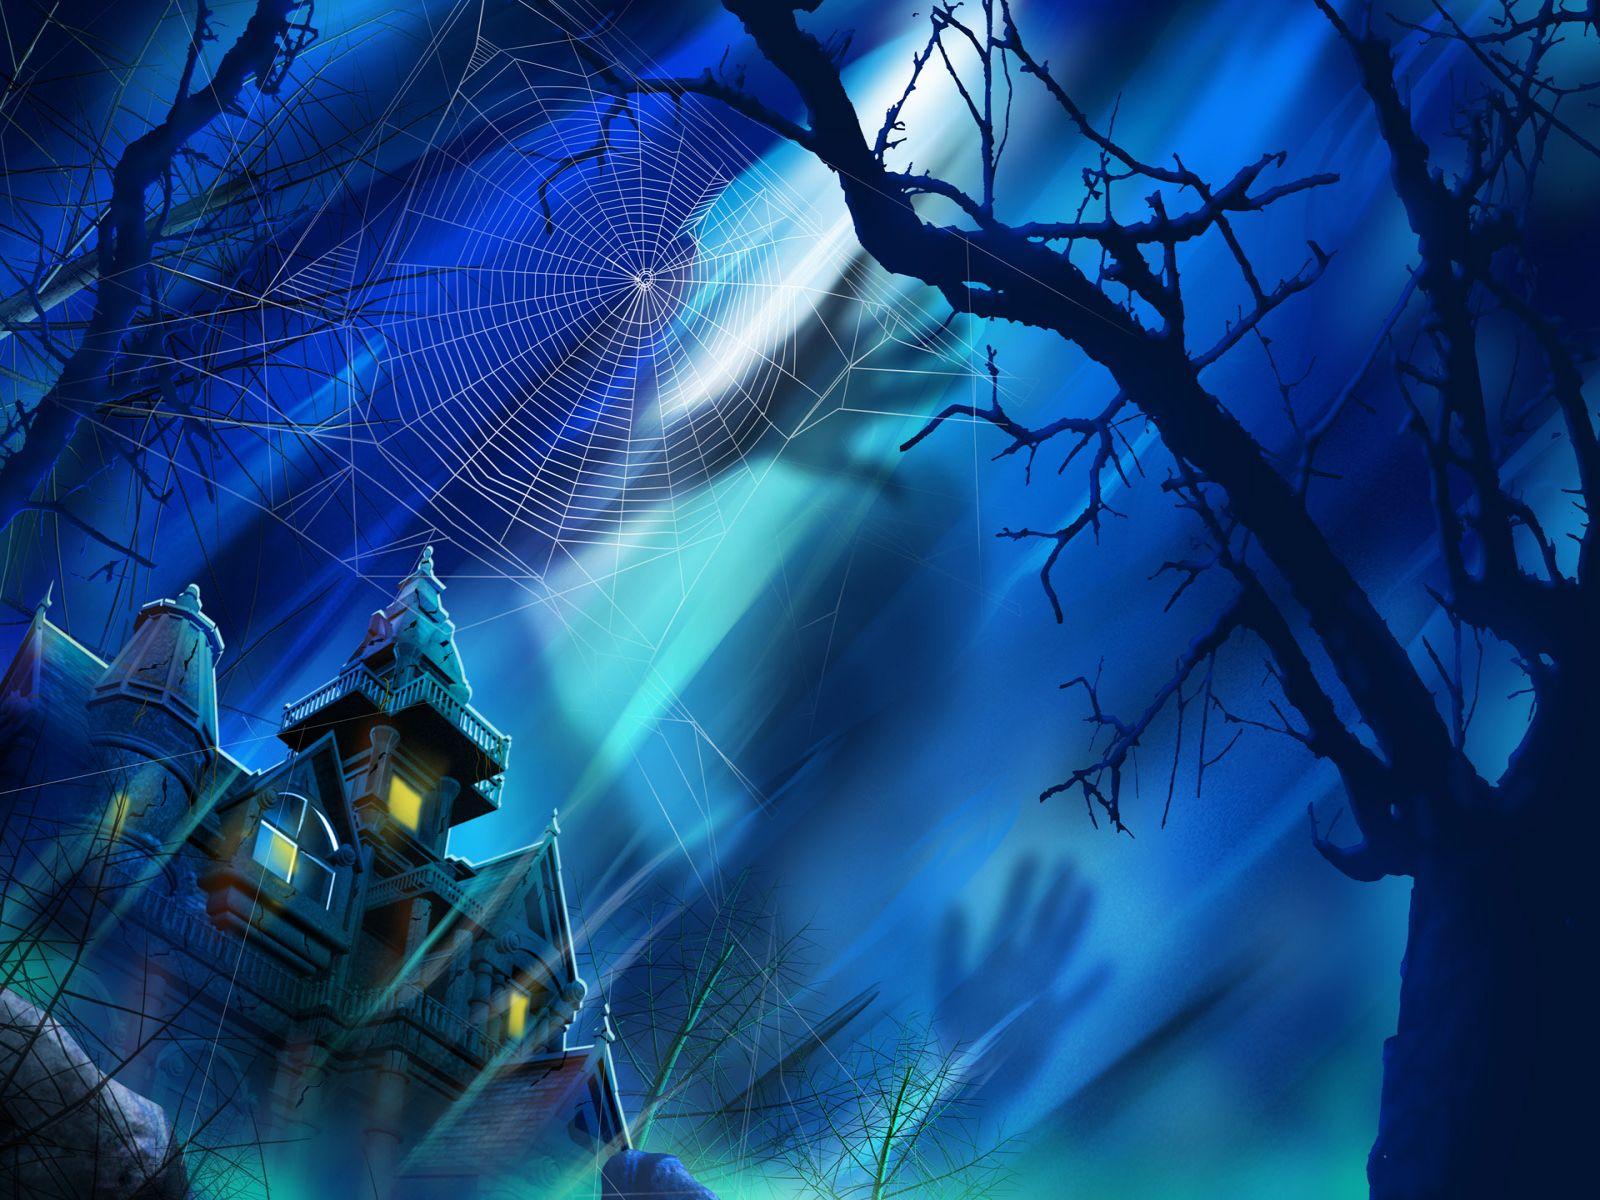 HD Halloween Wallpapers 1080p - WallpaperSafari